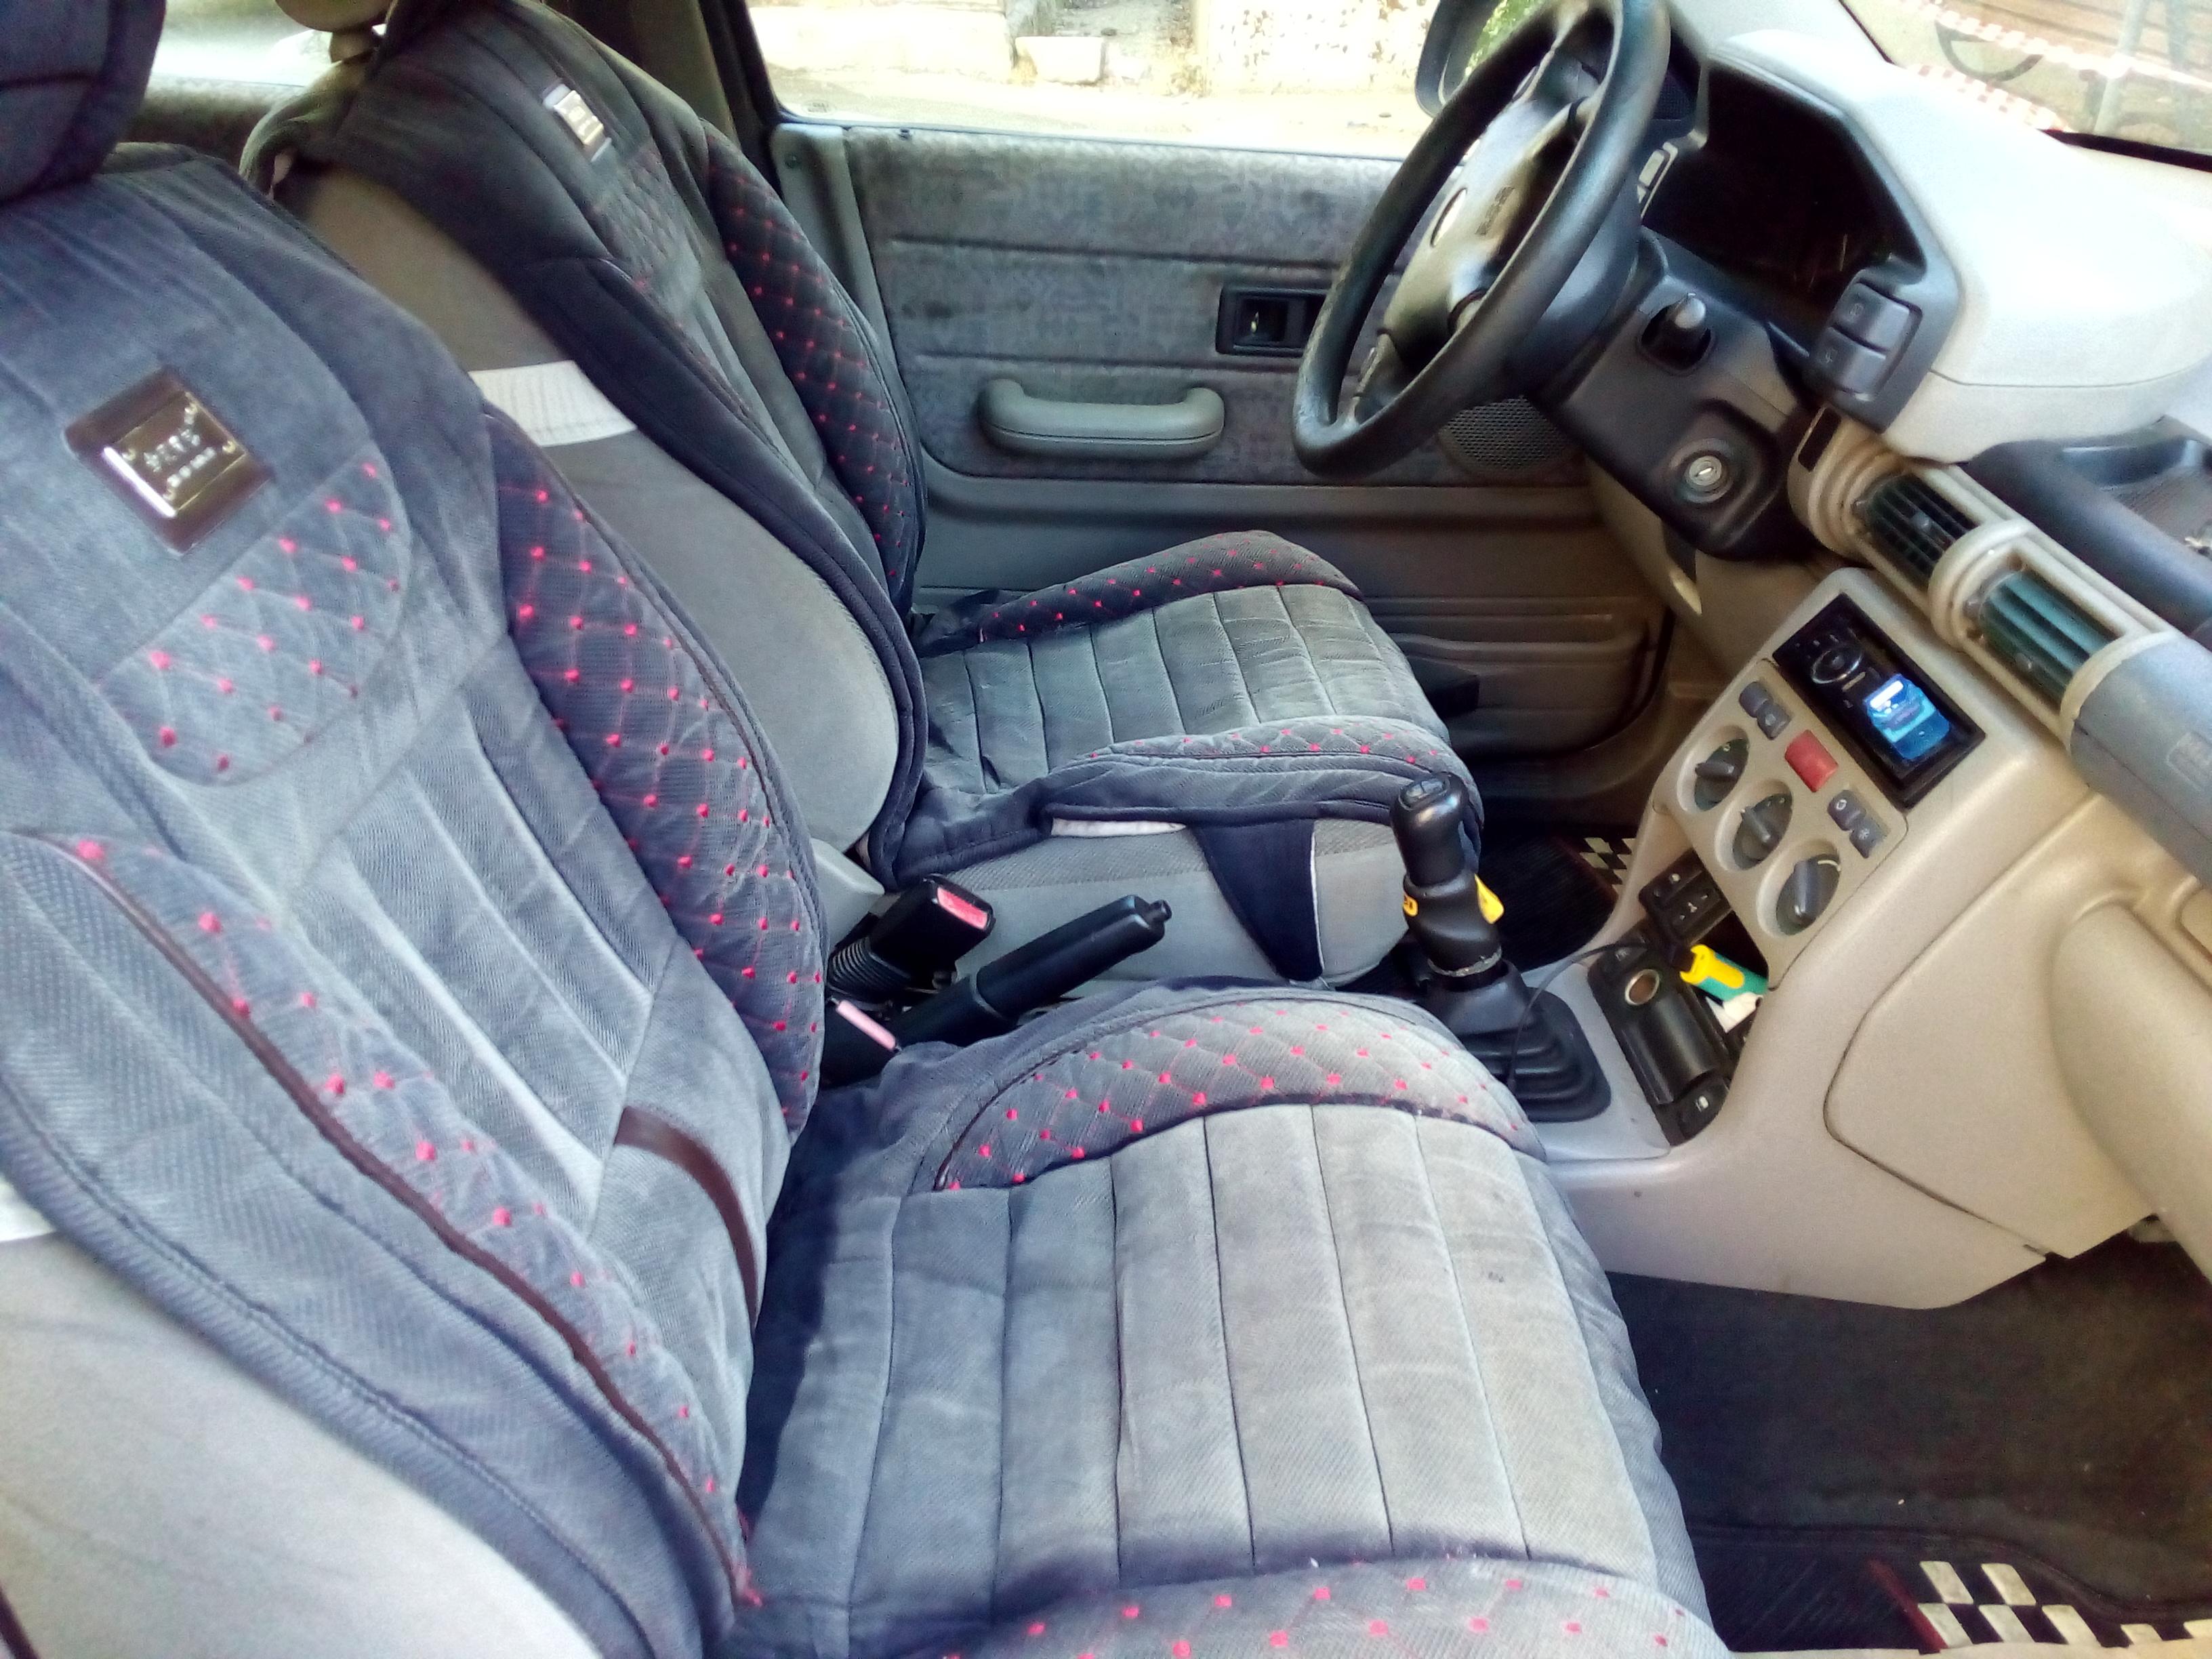 Land Rover Freelander 1.8(lt) 1999 İkinci əl  $5900